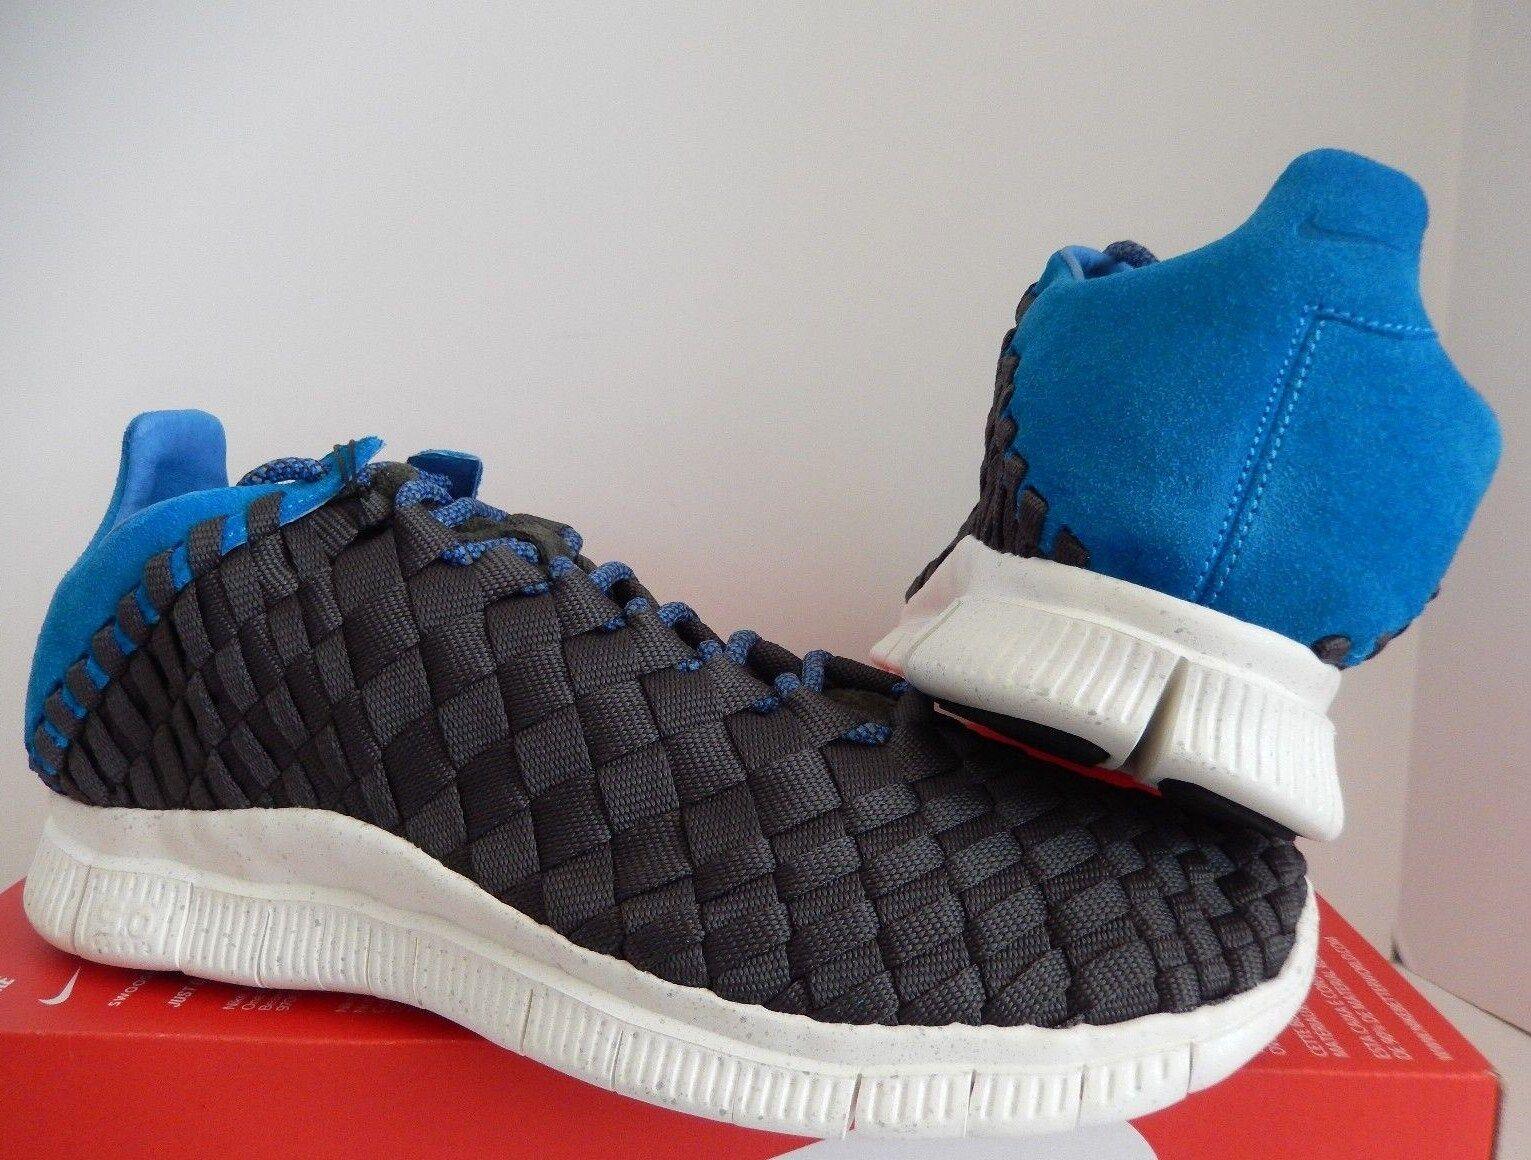 Nike free inneva inneva inneva aus zeitungspapier Grau-Blau hero-sail sz 11 [579916-004] cdf941